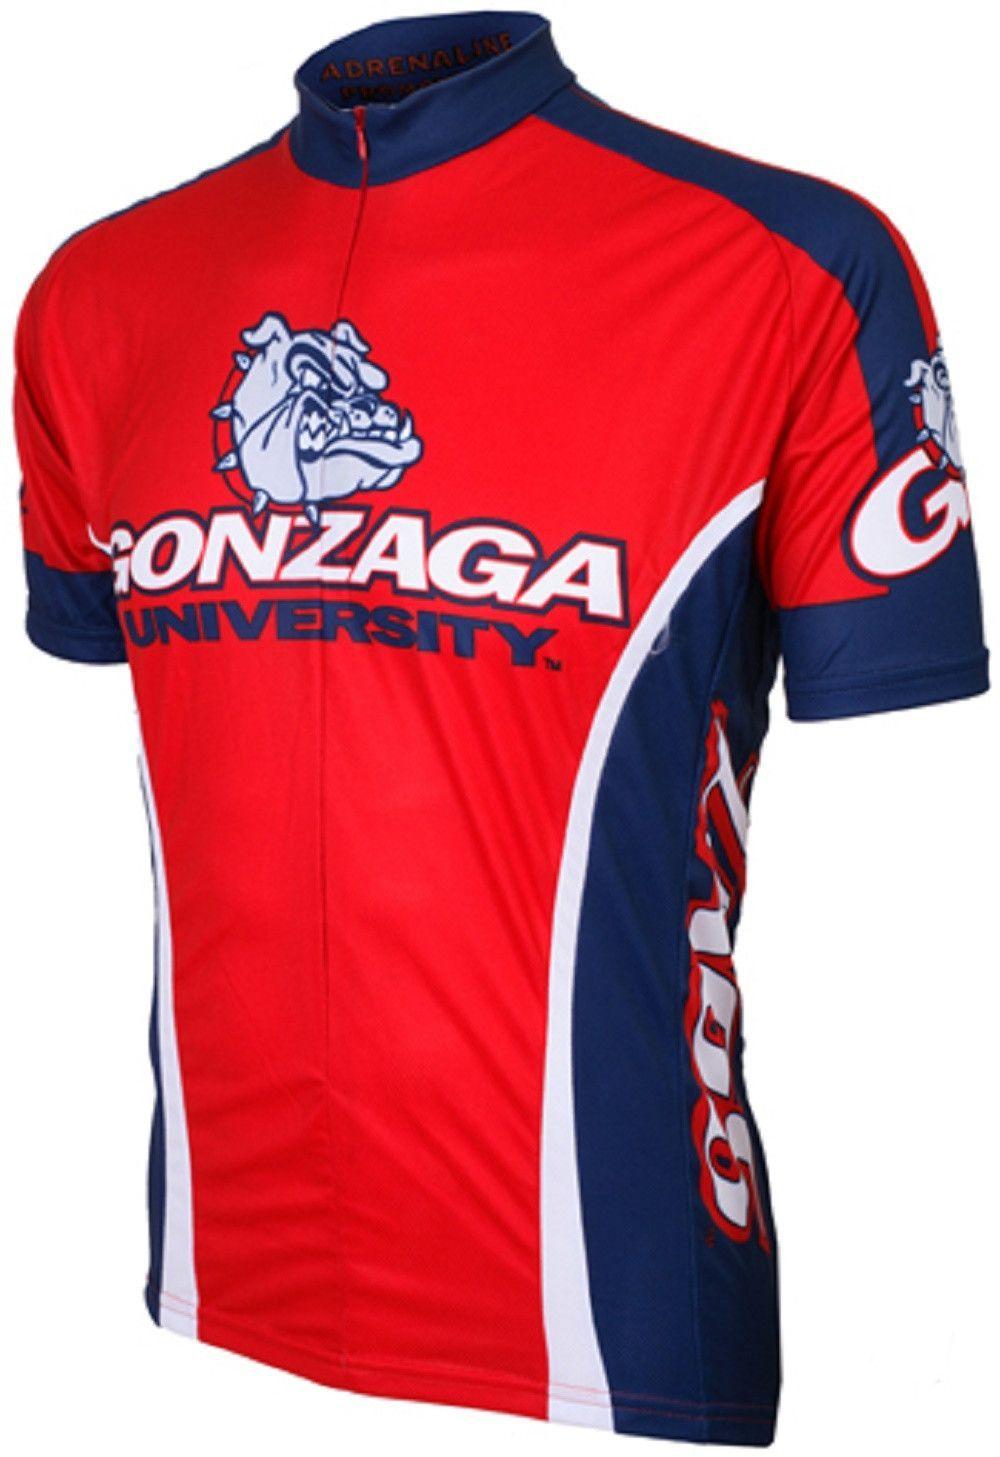 94bf02efc NCAA Men s Adrenaline Promotions Gonzaga Bulldogs Road Cycling Jersey